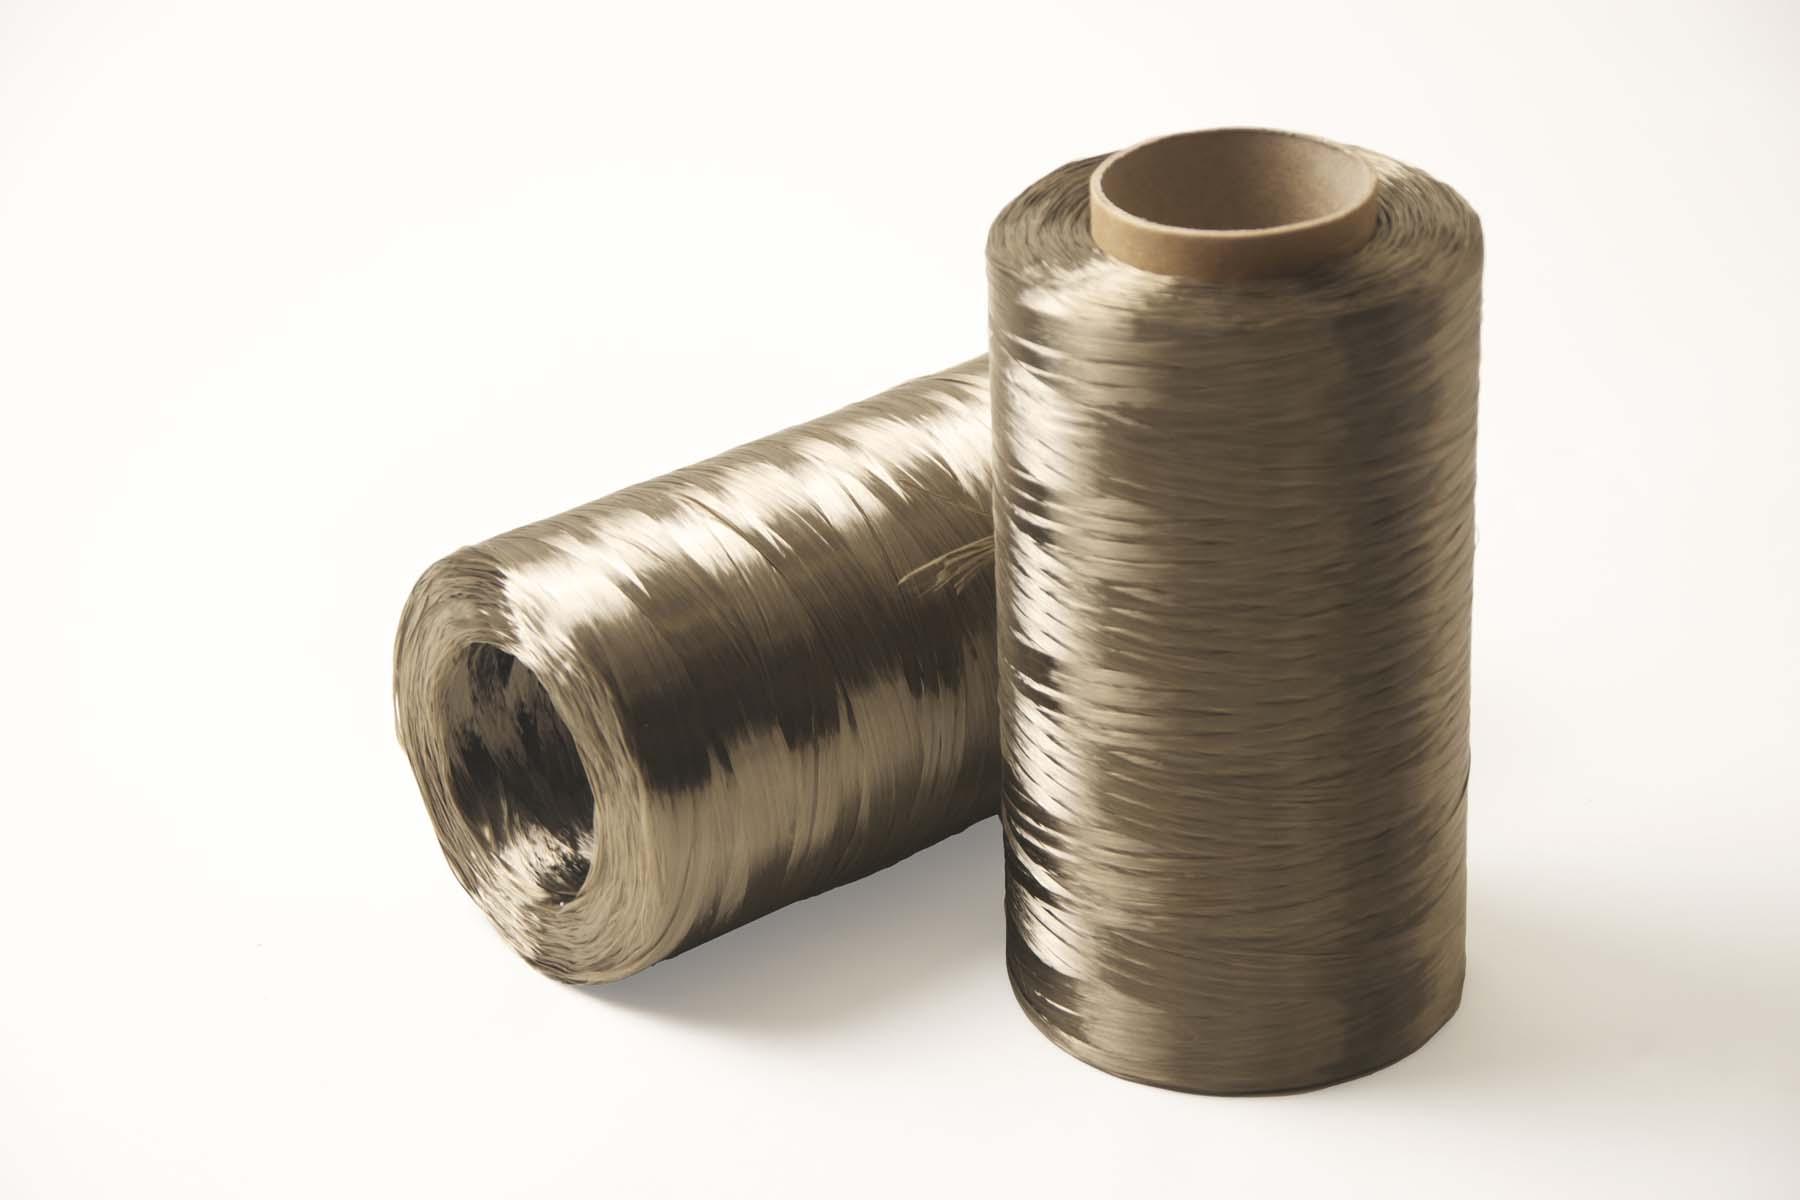 Spools of Mafic Basalt Fiber product